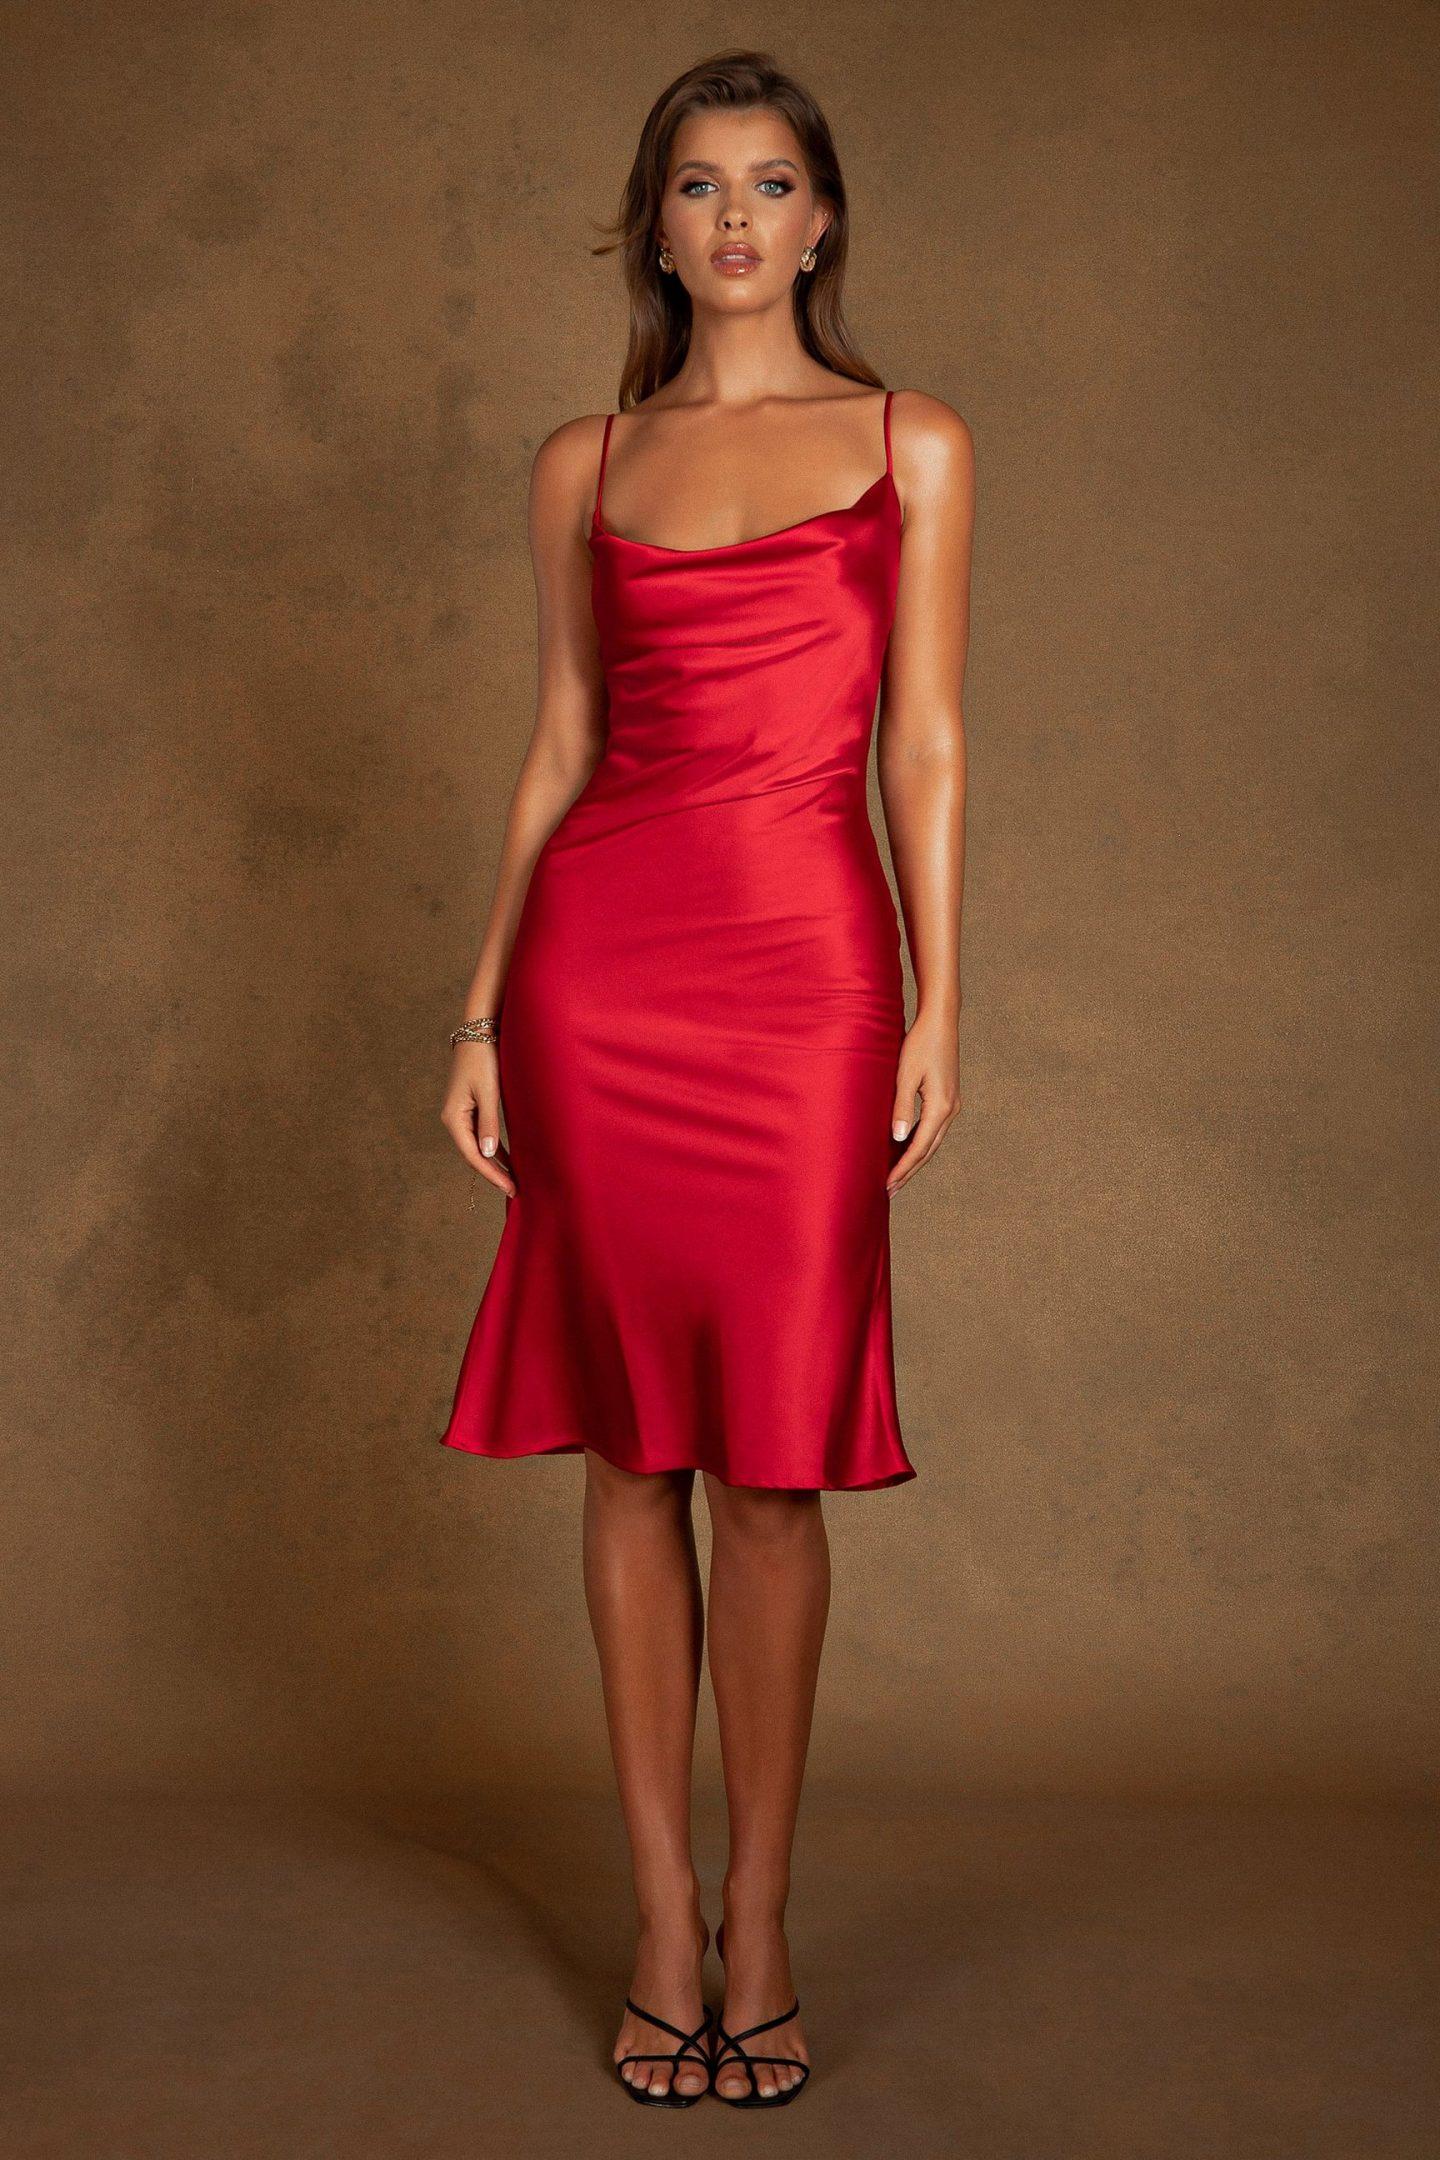 Satin red slip dress